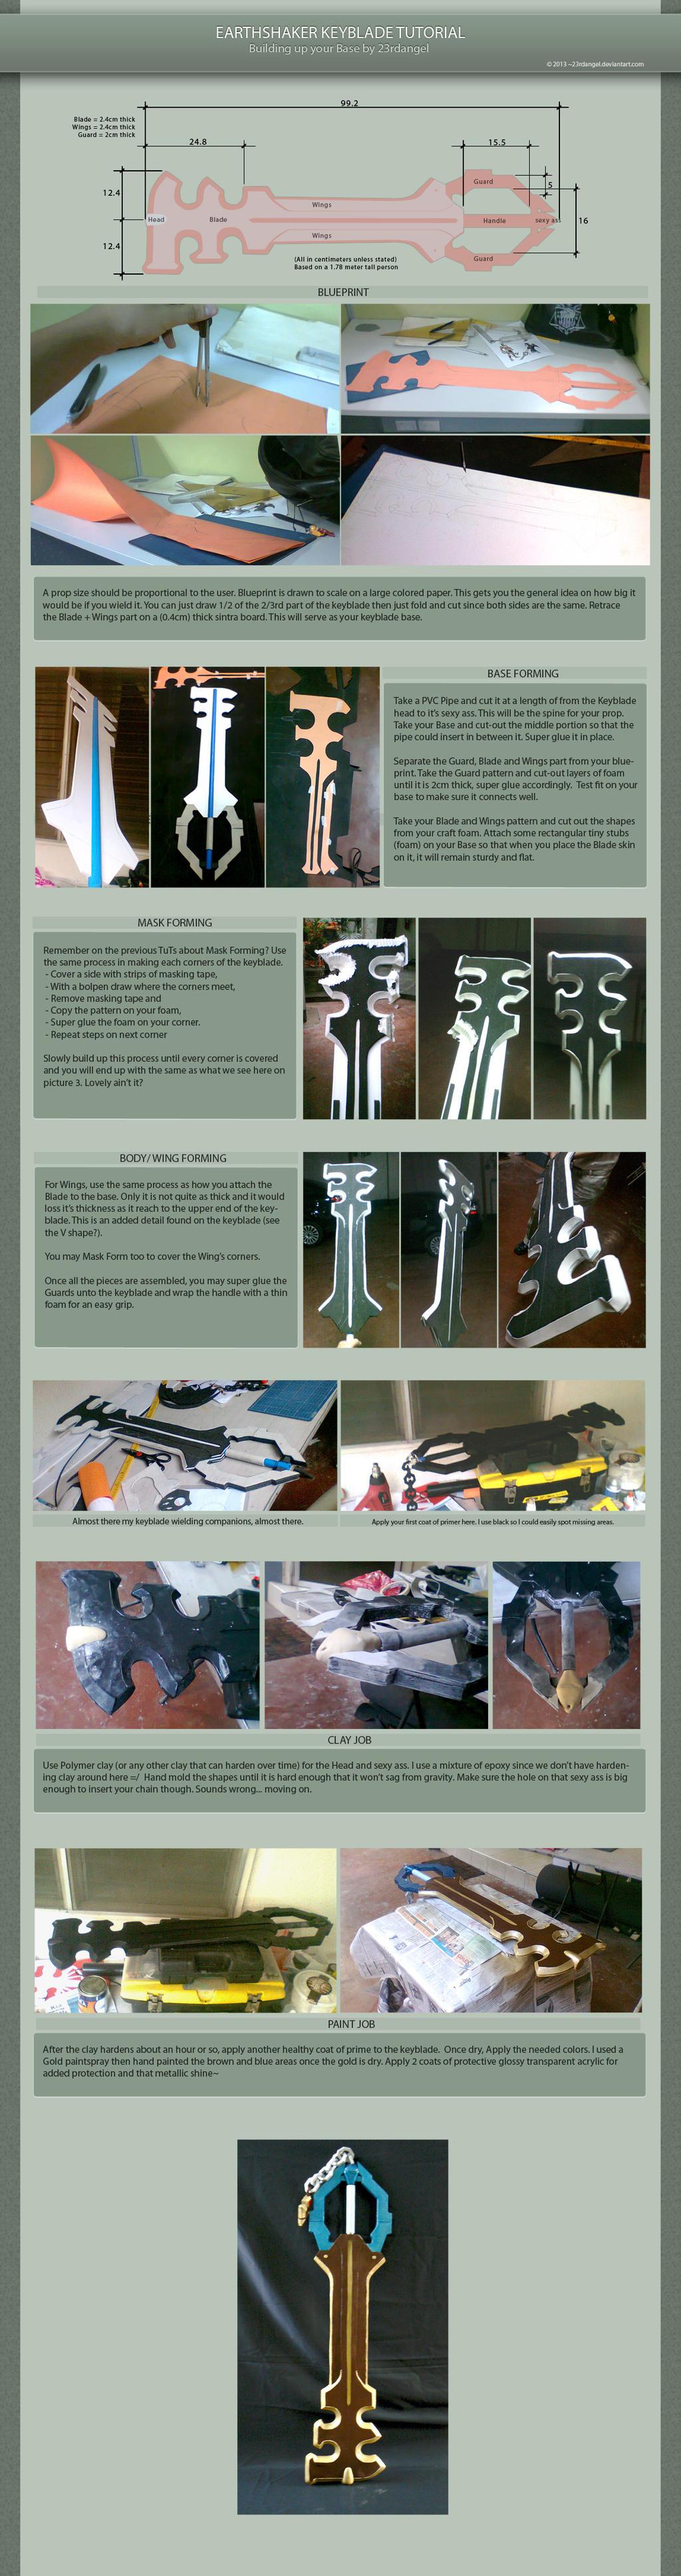 Earthshaker Tutorial: Keyblade by 23rdAngel